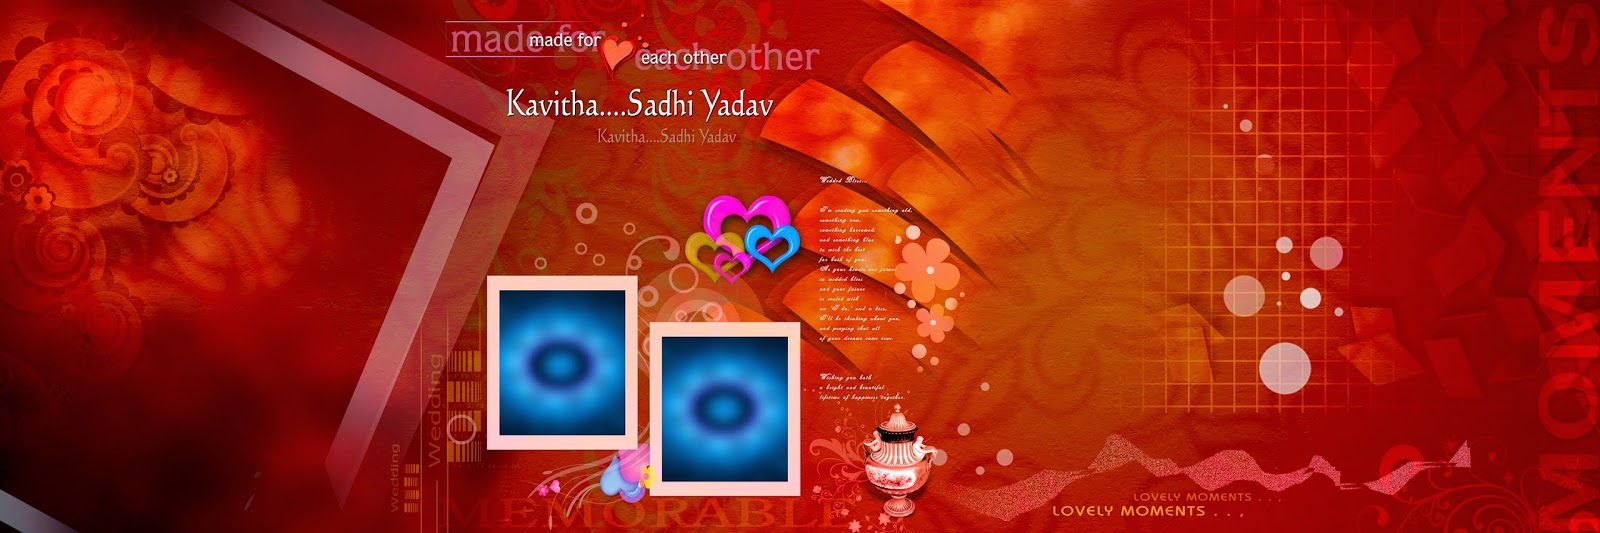 indian wedding Album design Psd templates file free ... Karizma Wedding Album Software Free Download